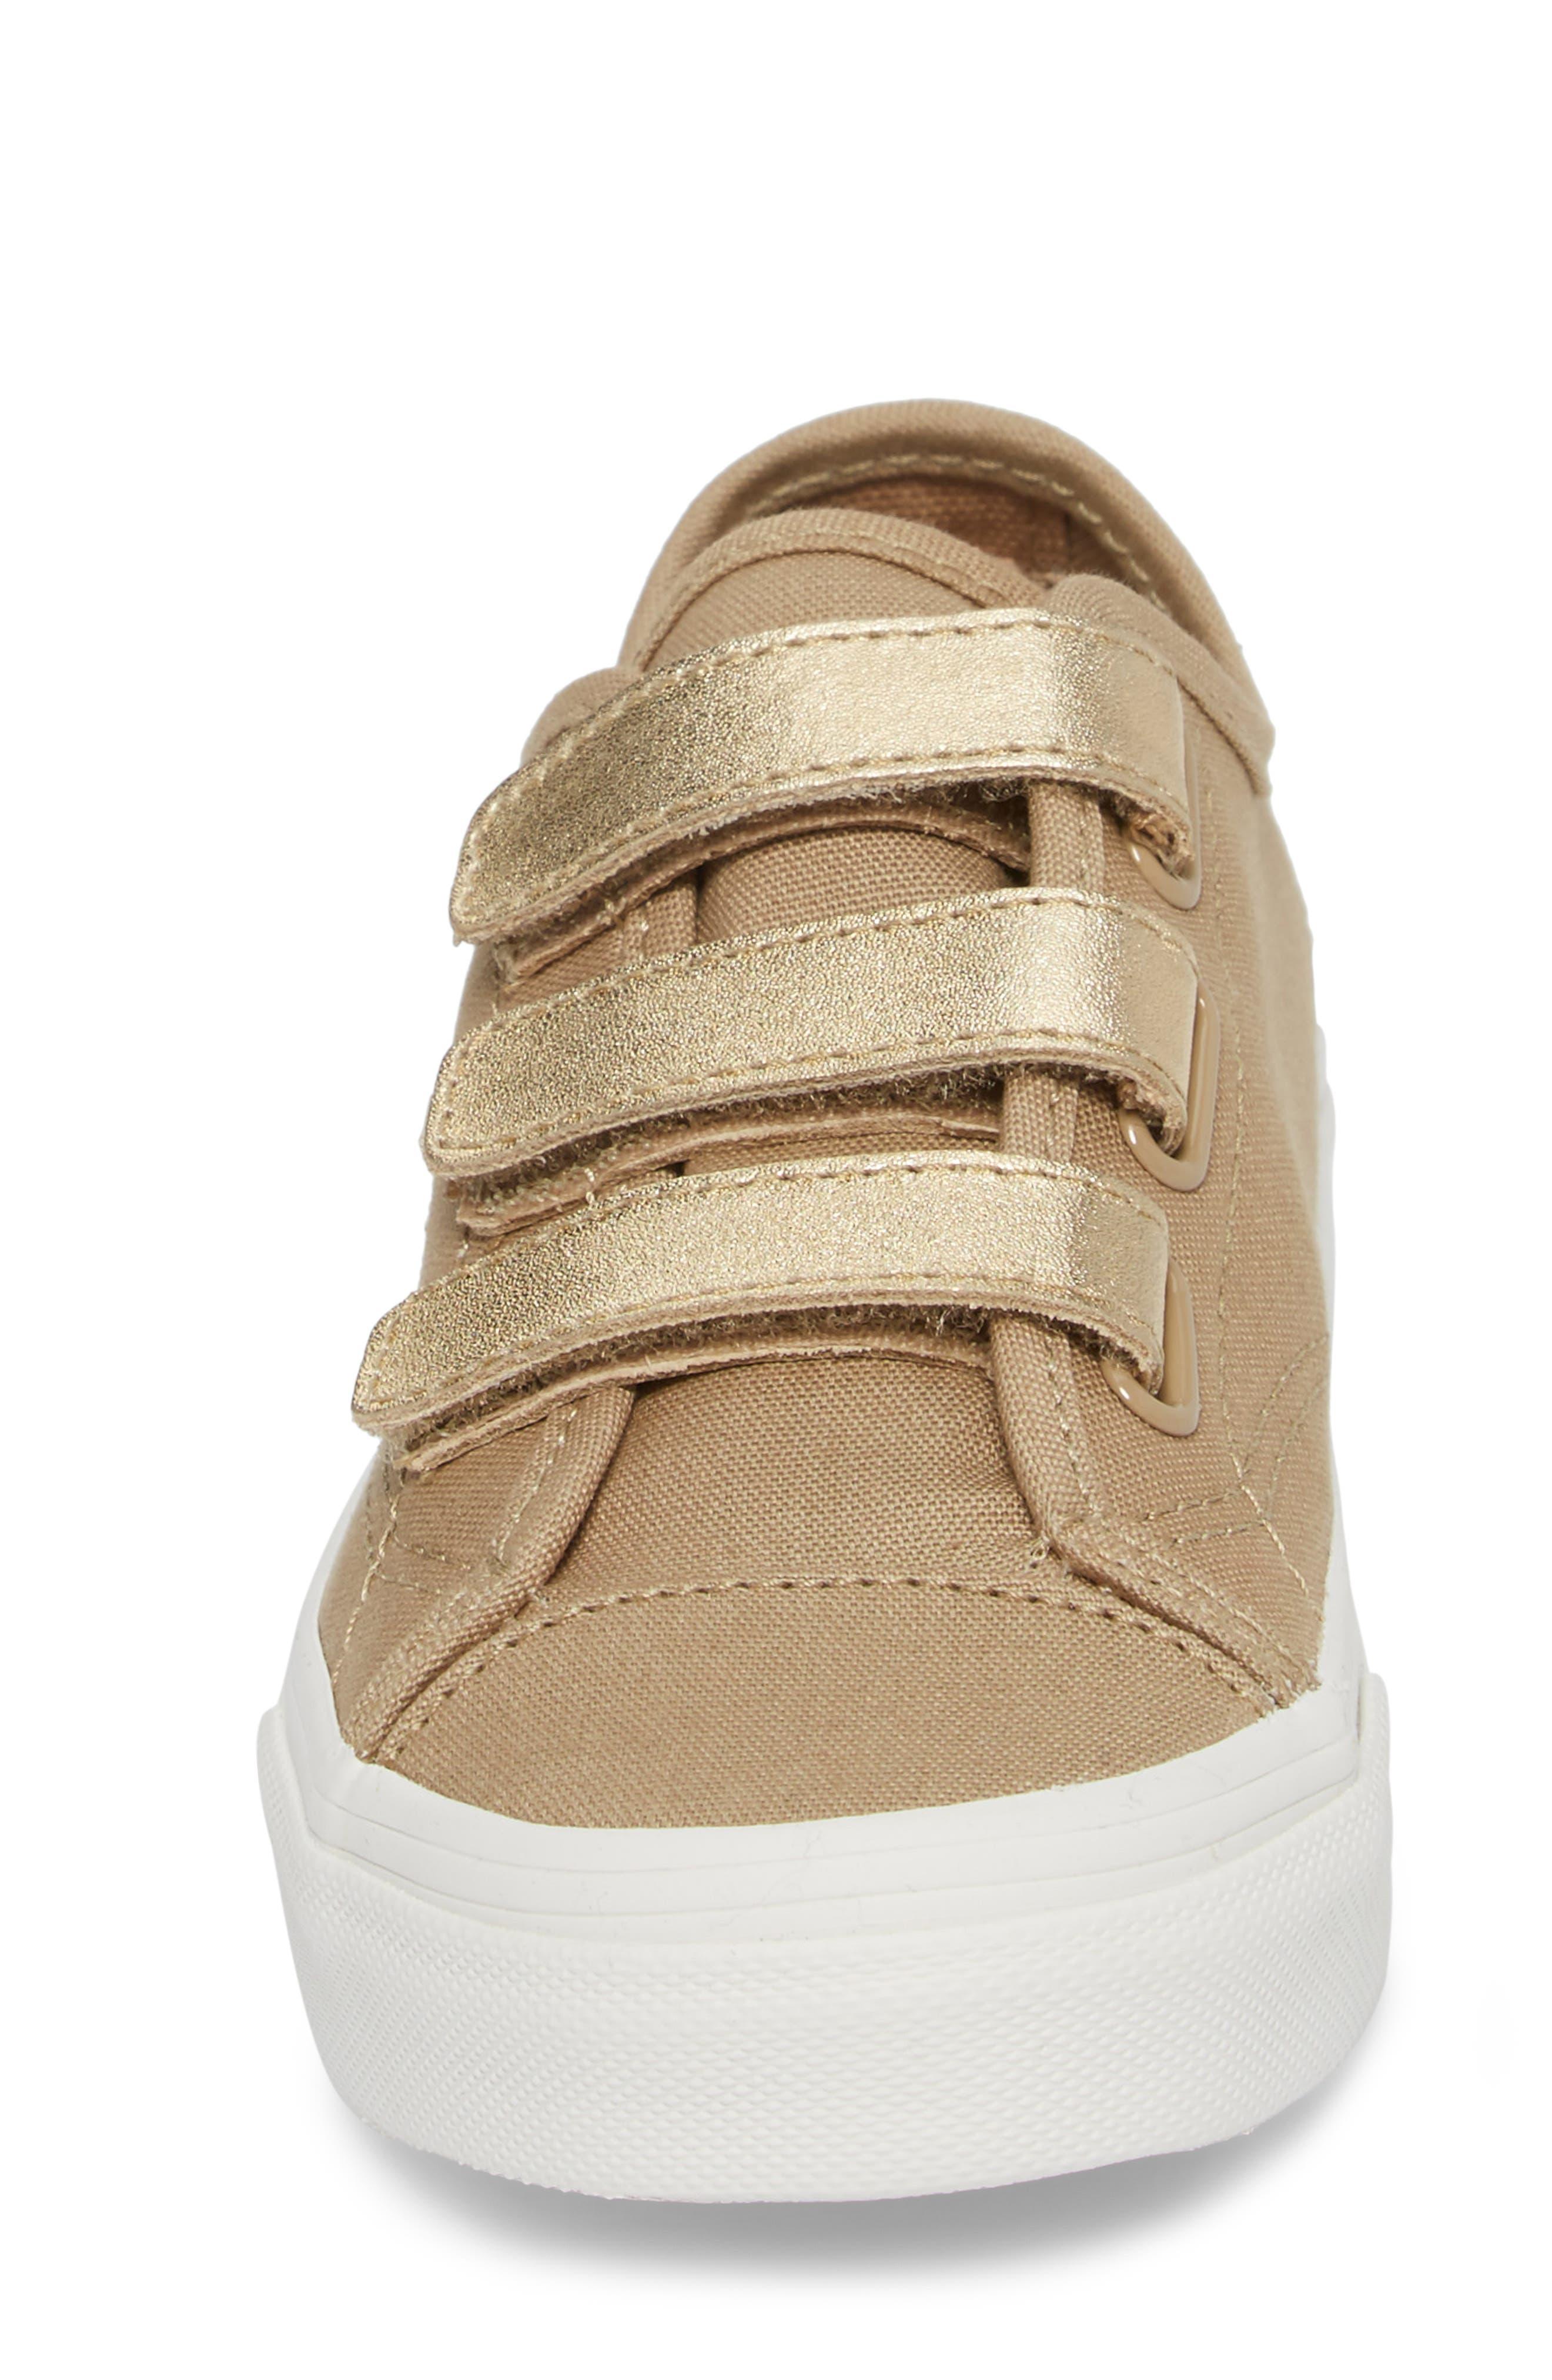 Style 23V Sneaker,                             Alternate thumbnail 4, color,                             Metallic/ Cornstalk